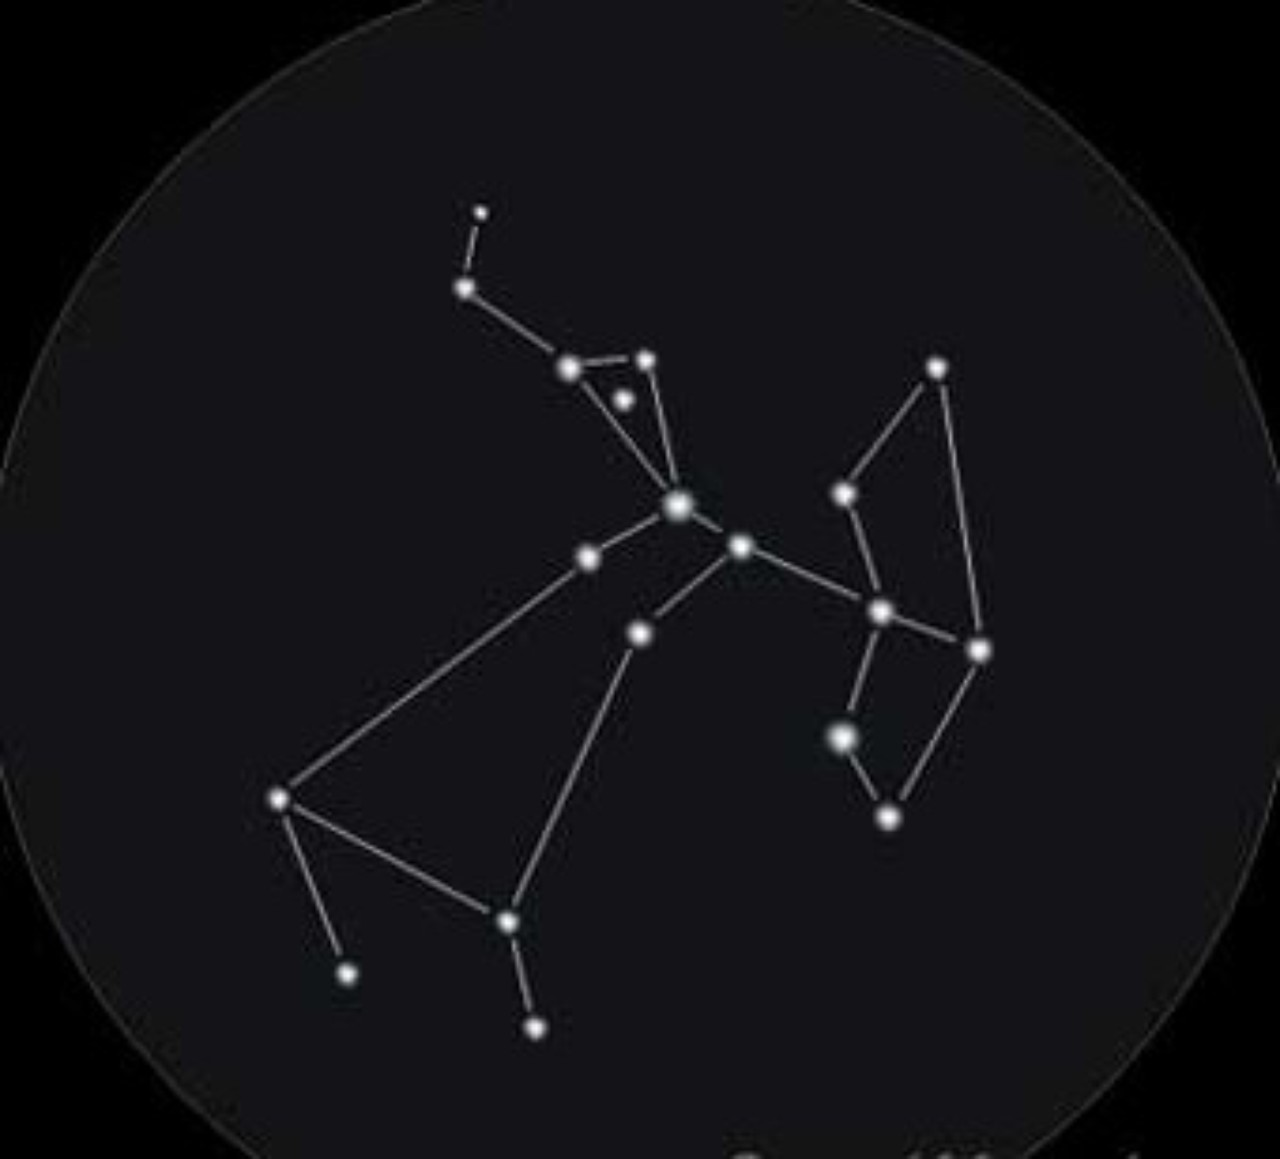 созвездие стрелец картинки талисман под конкретного